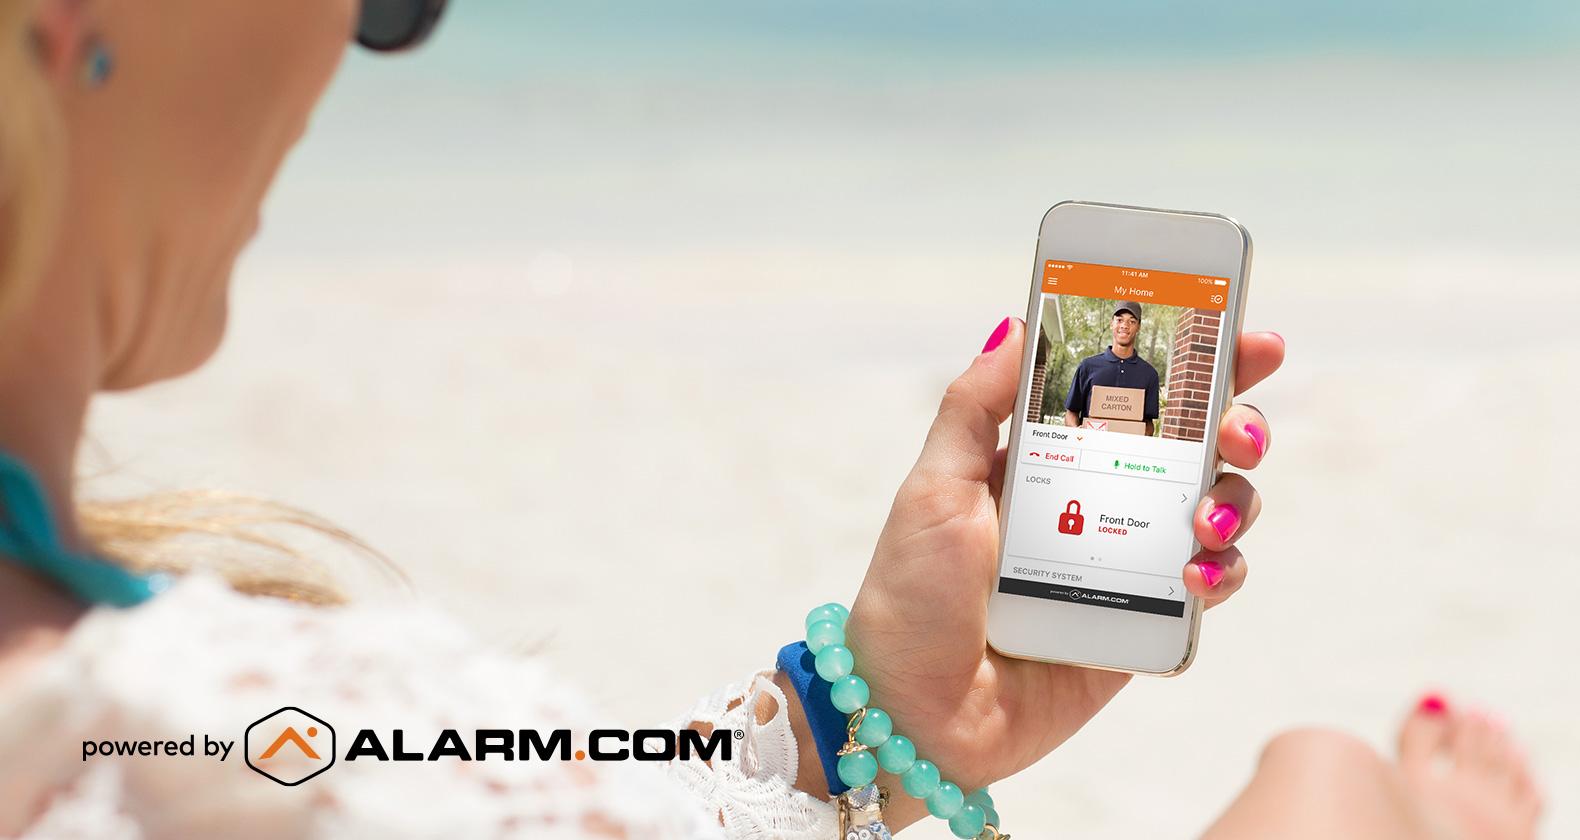 Vacation Travel Security 1 FB.jpg